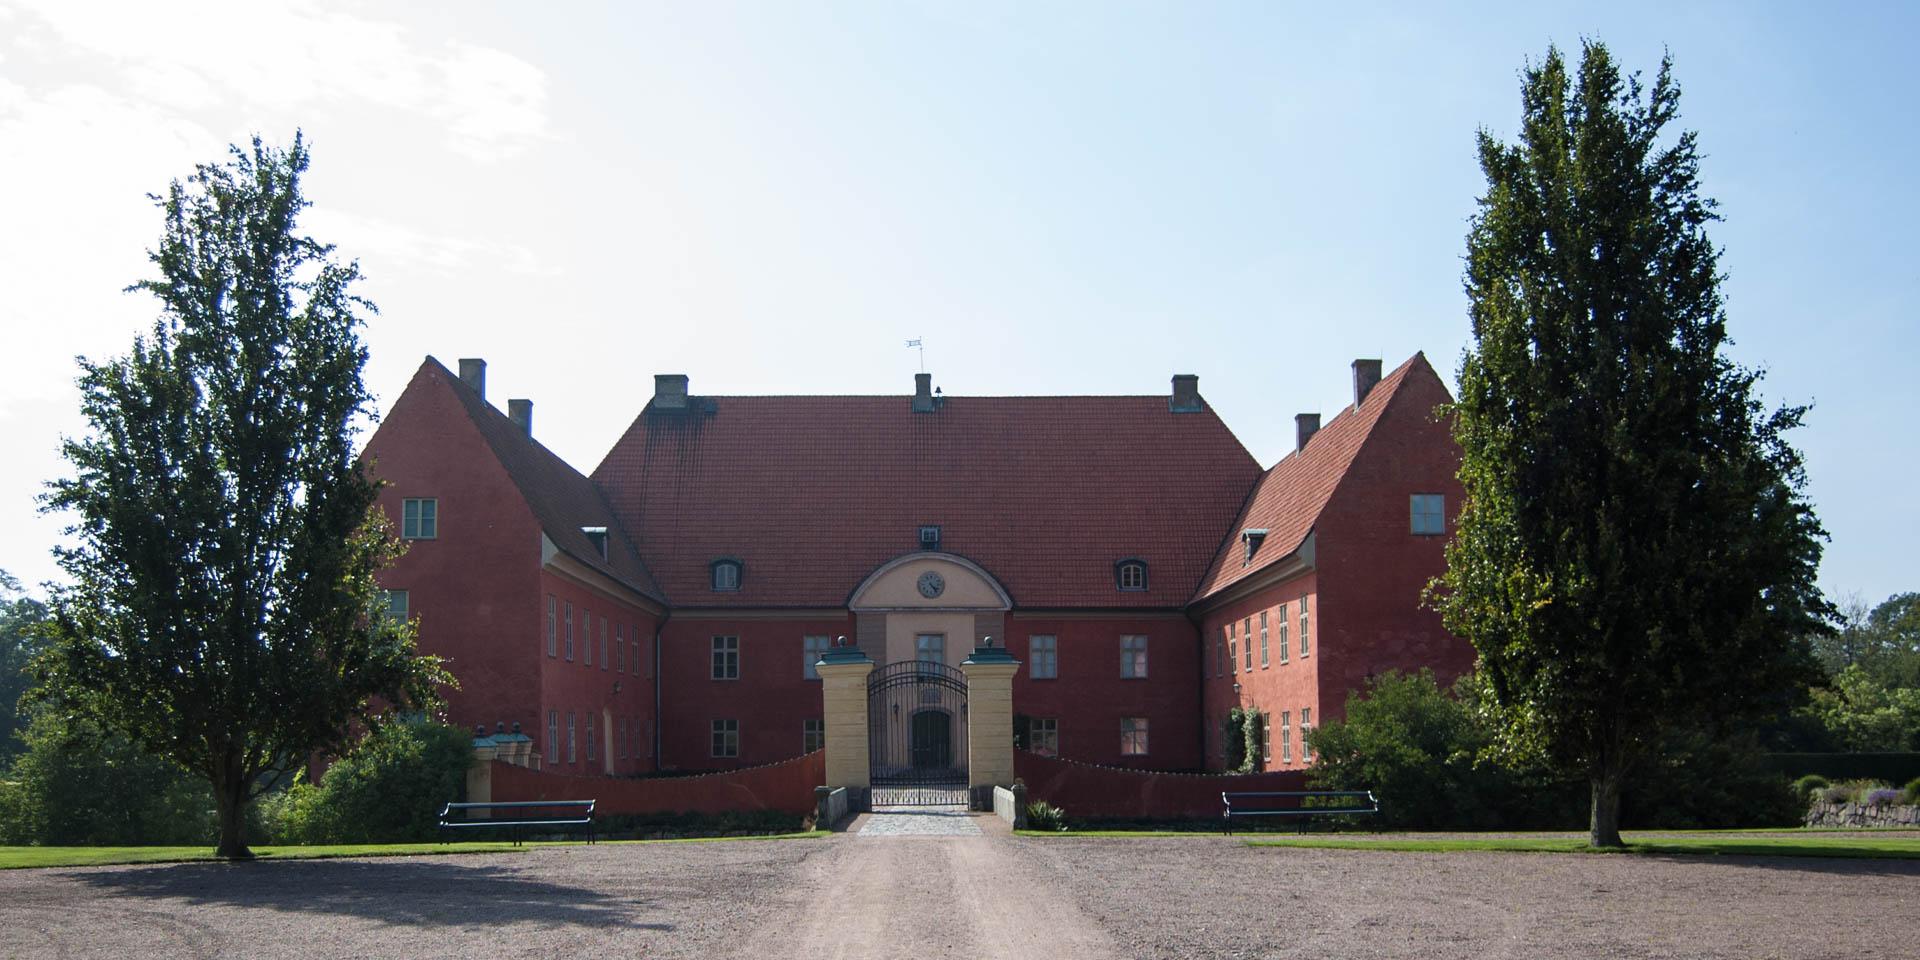 Krapperups slott 2011